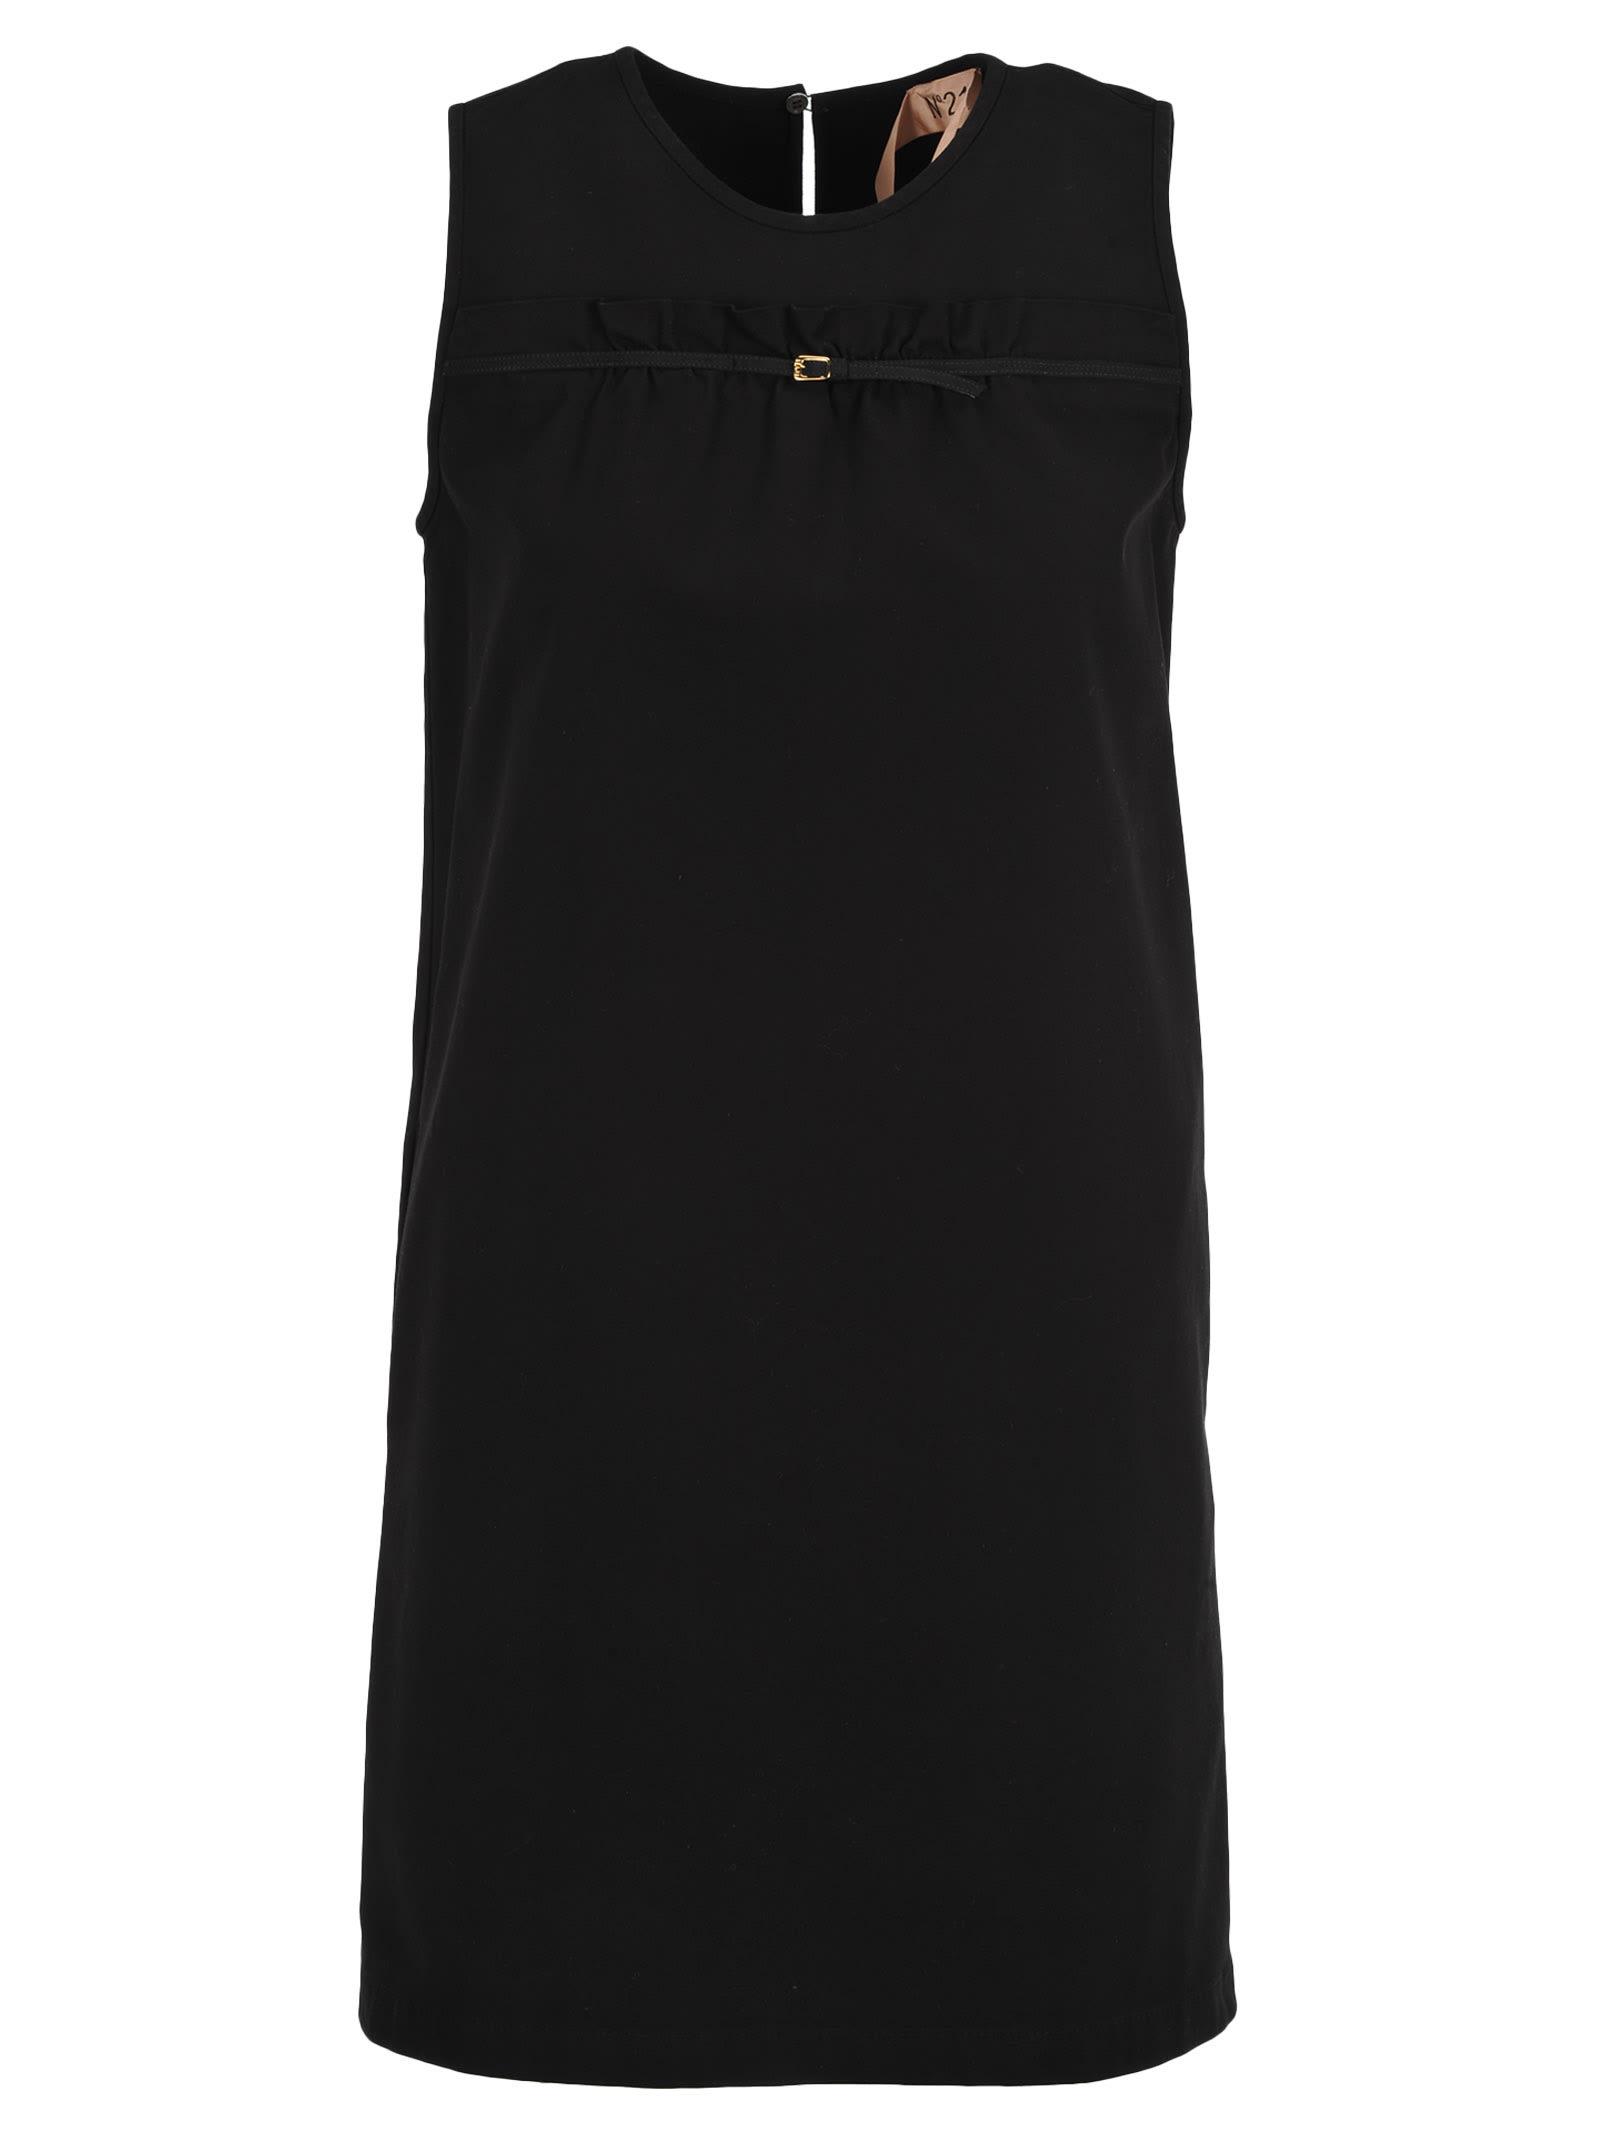 N21 Nº21 Bukle Detail Mini Dress